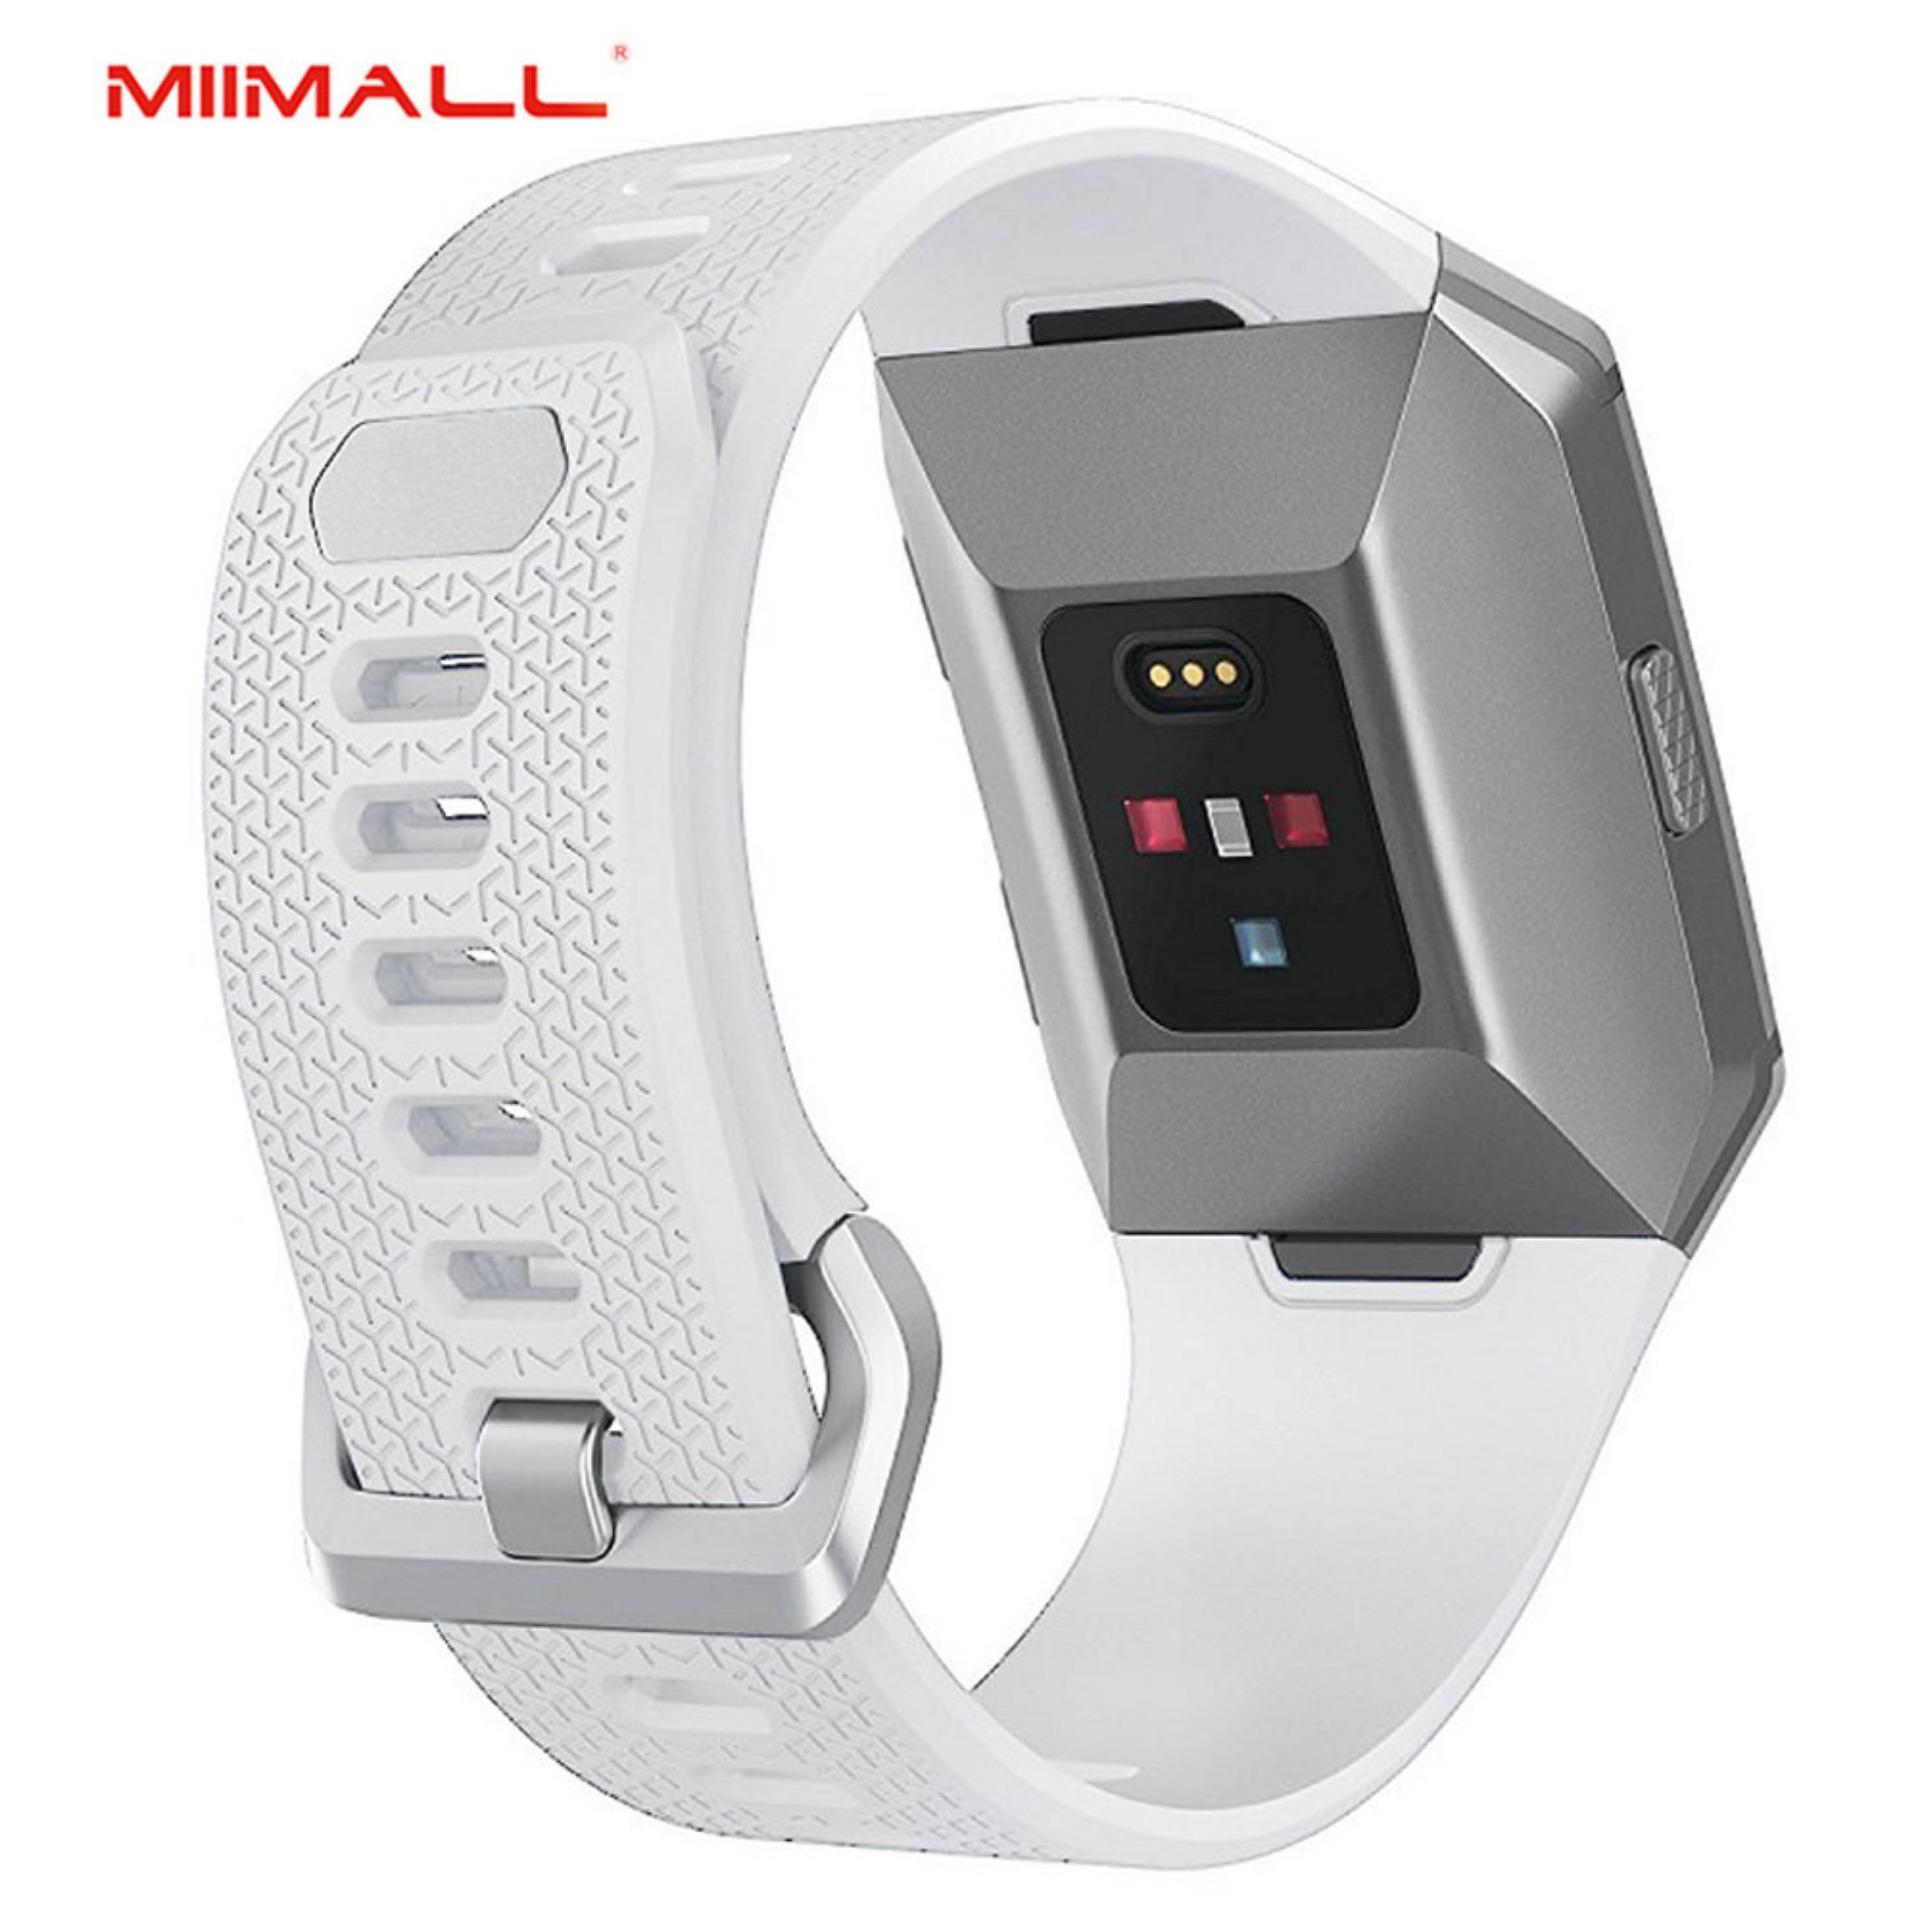 Miimall Lembut Silicone Strap Adjustable Replacement Sport Band Aksesoris untuk Ionic Smart Fitness Watch-Intl